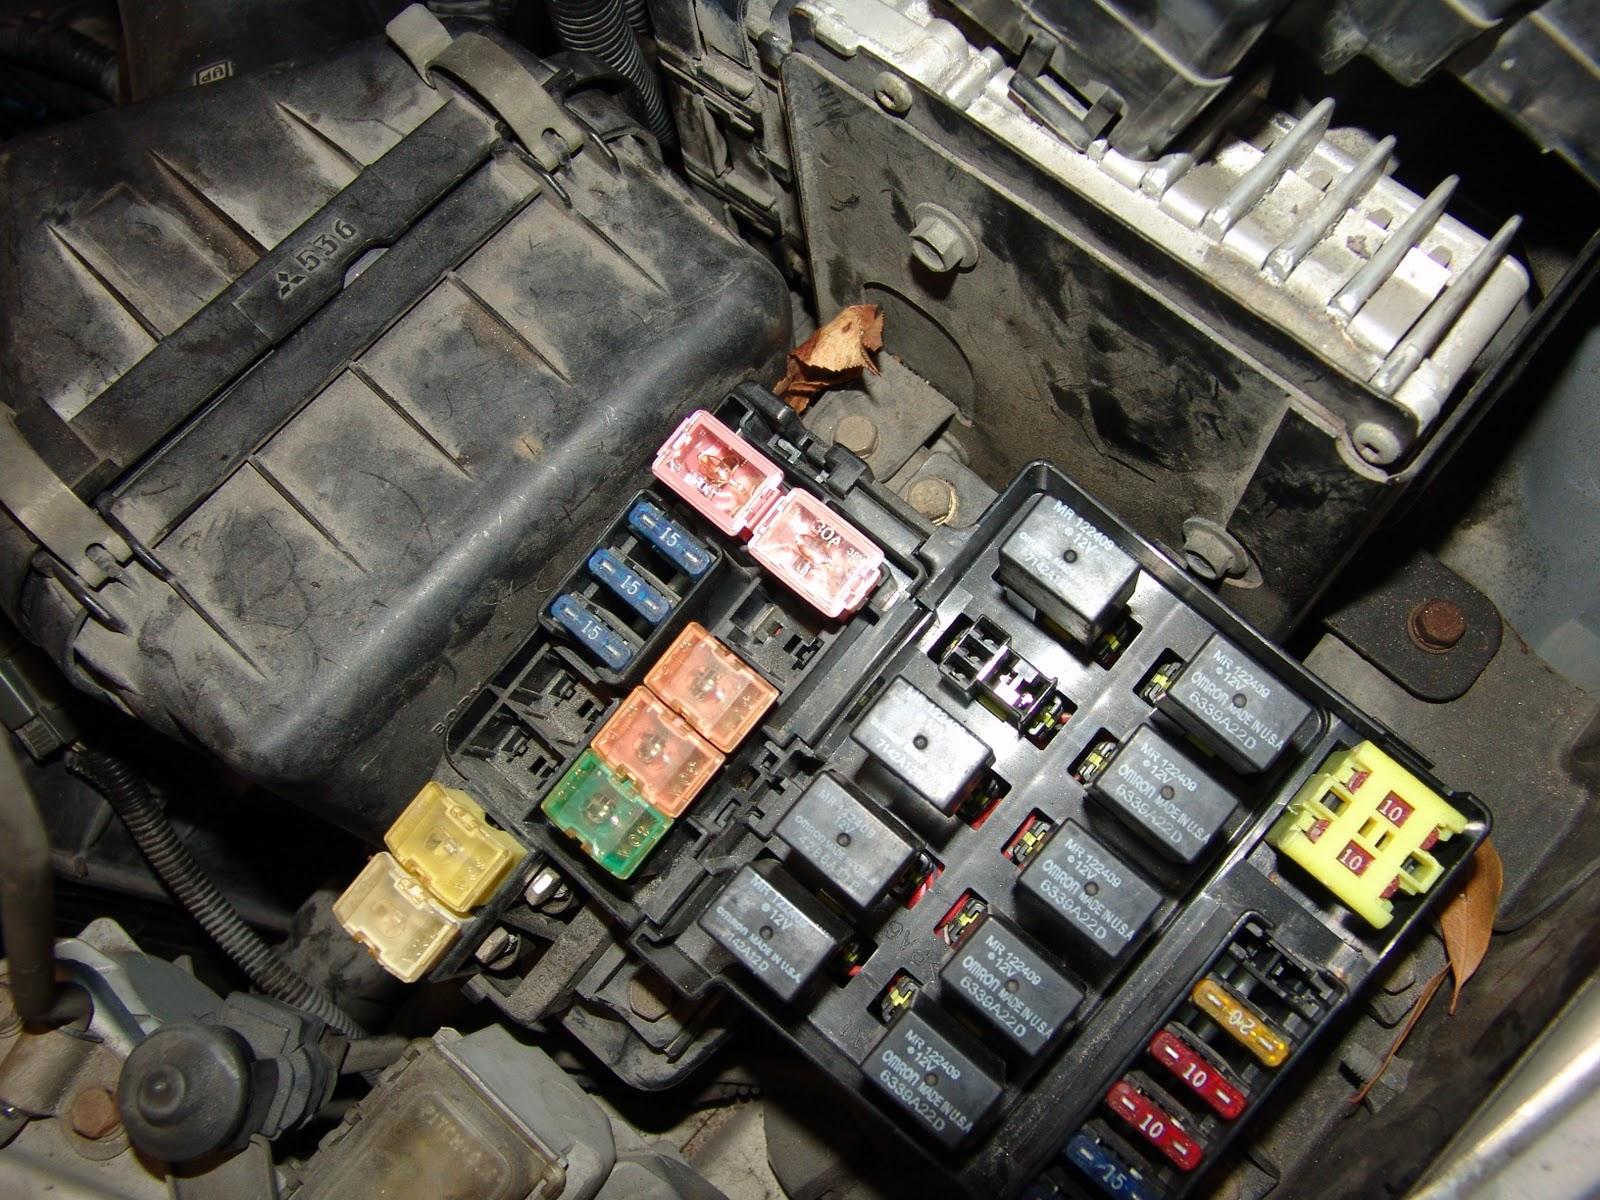 2006 Vw Beetle Battery Fuse Box Diagram Manual Of Wiring 2002 Melting Free Engine